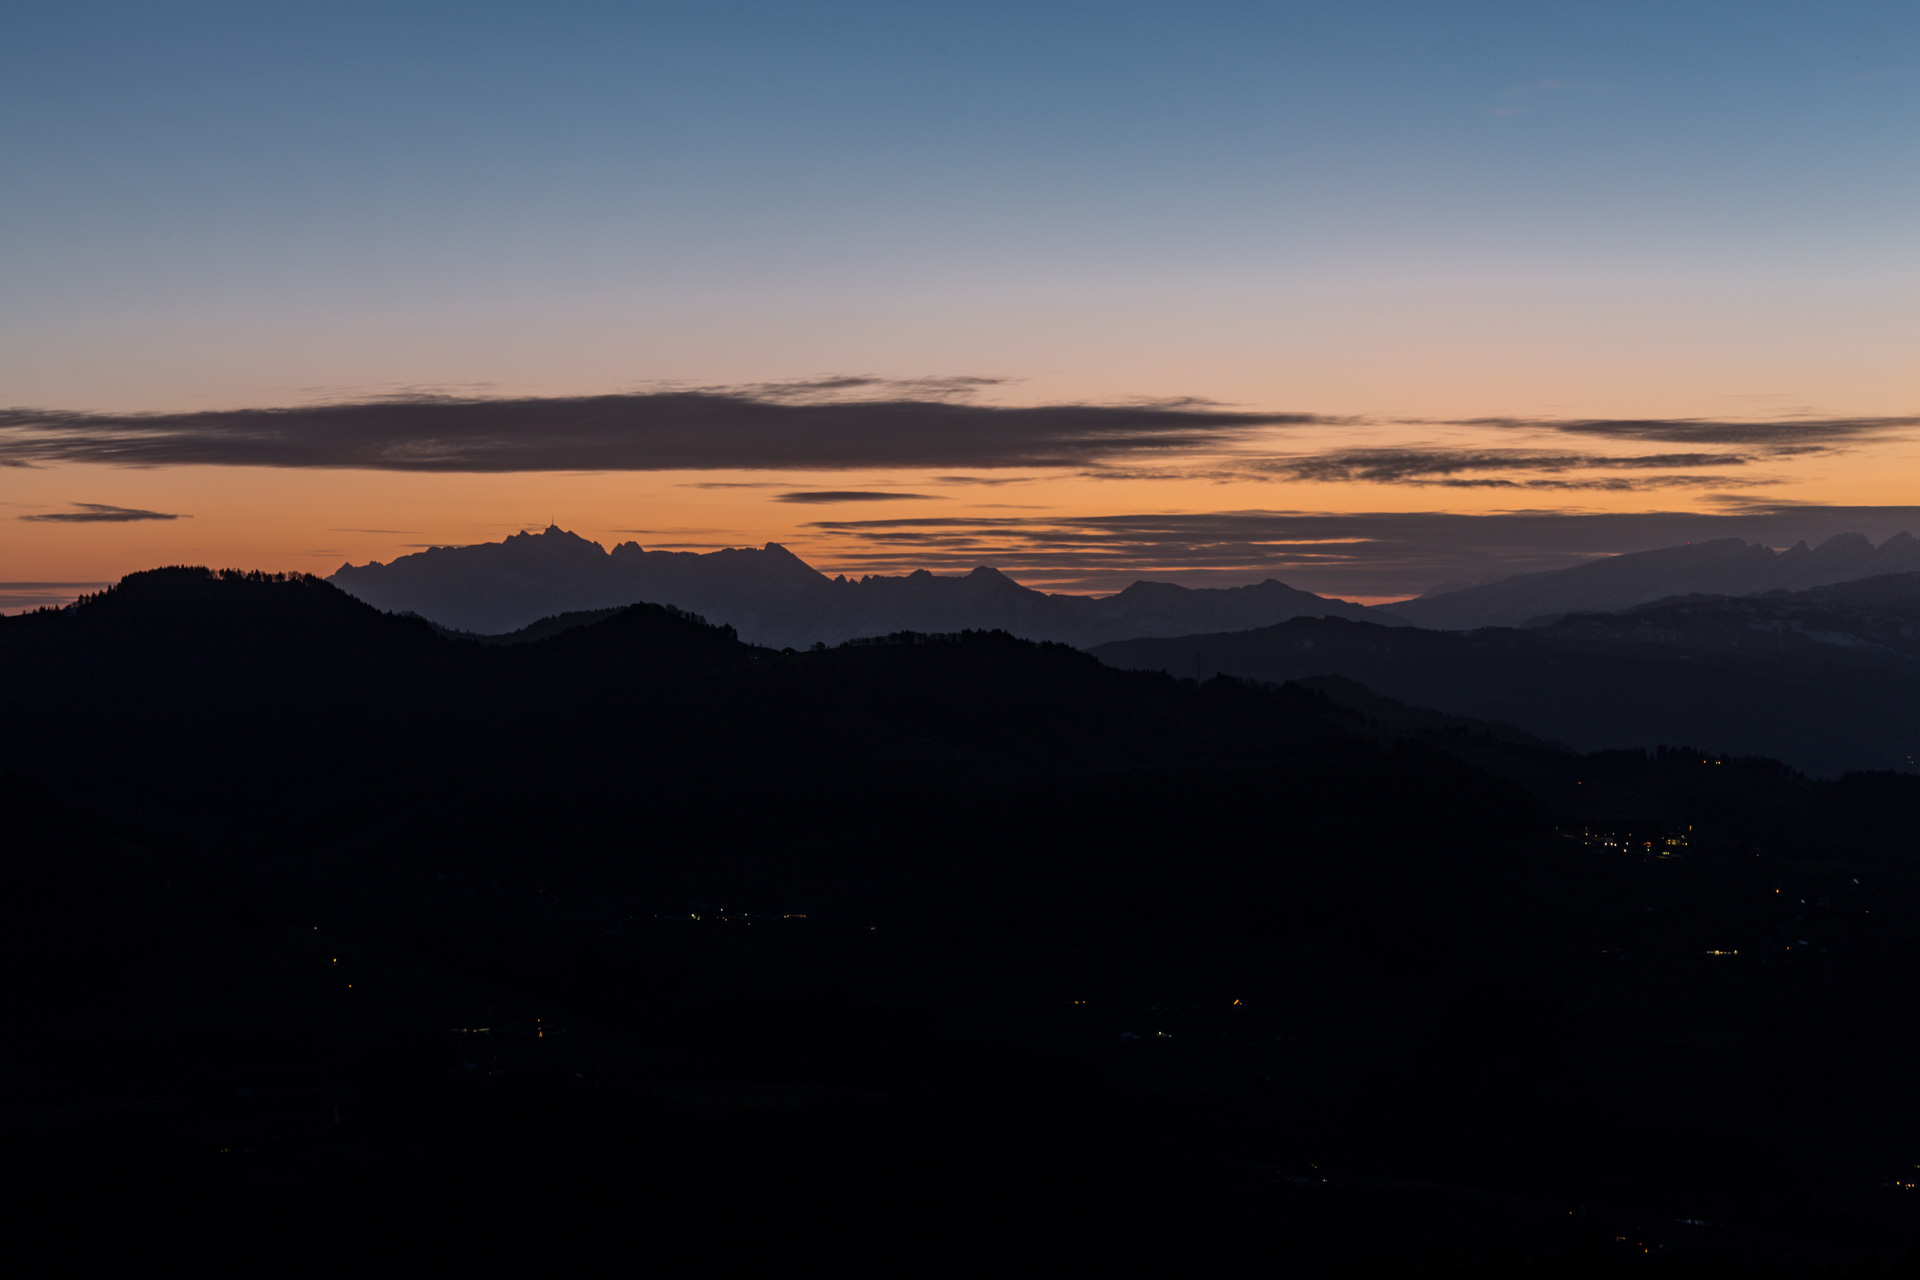 Sonnenaufgang-Bachtelturm_20151219_5831-1